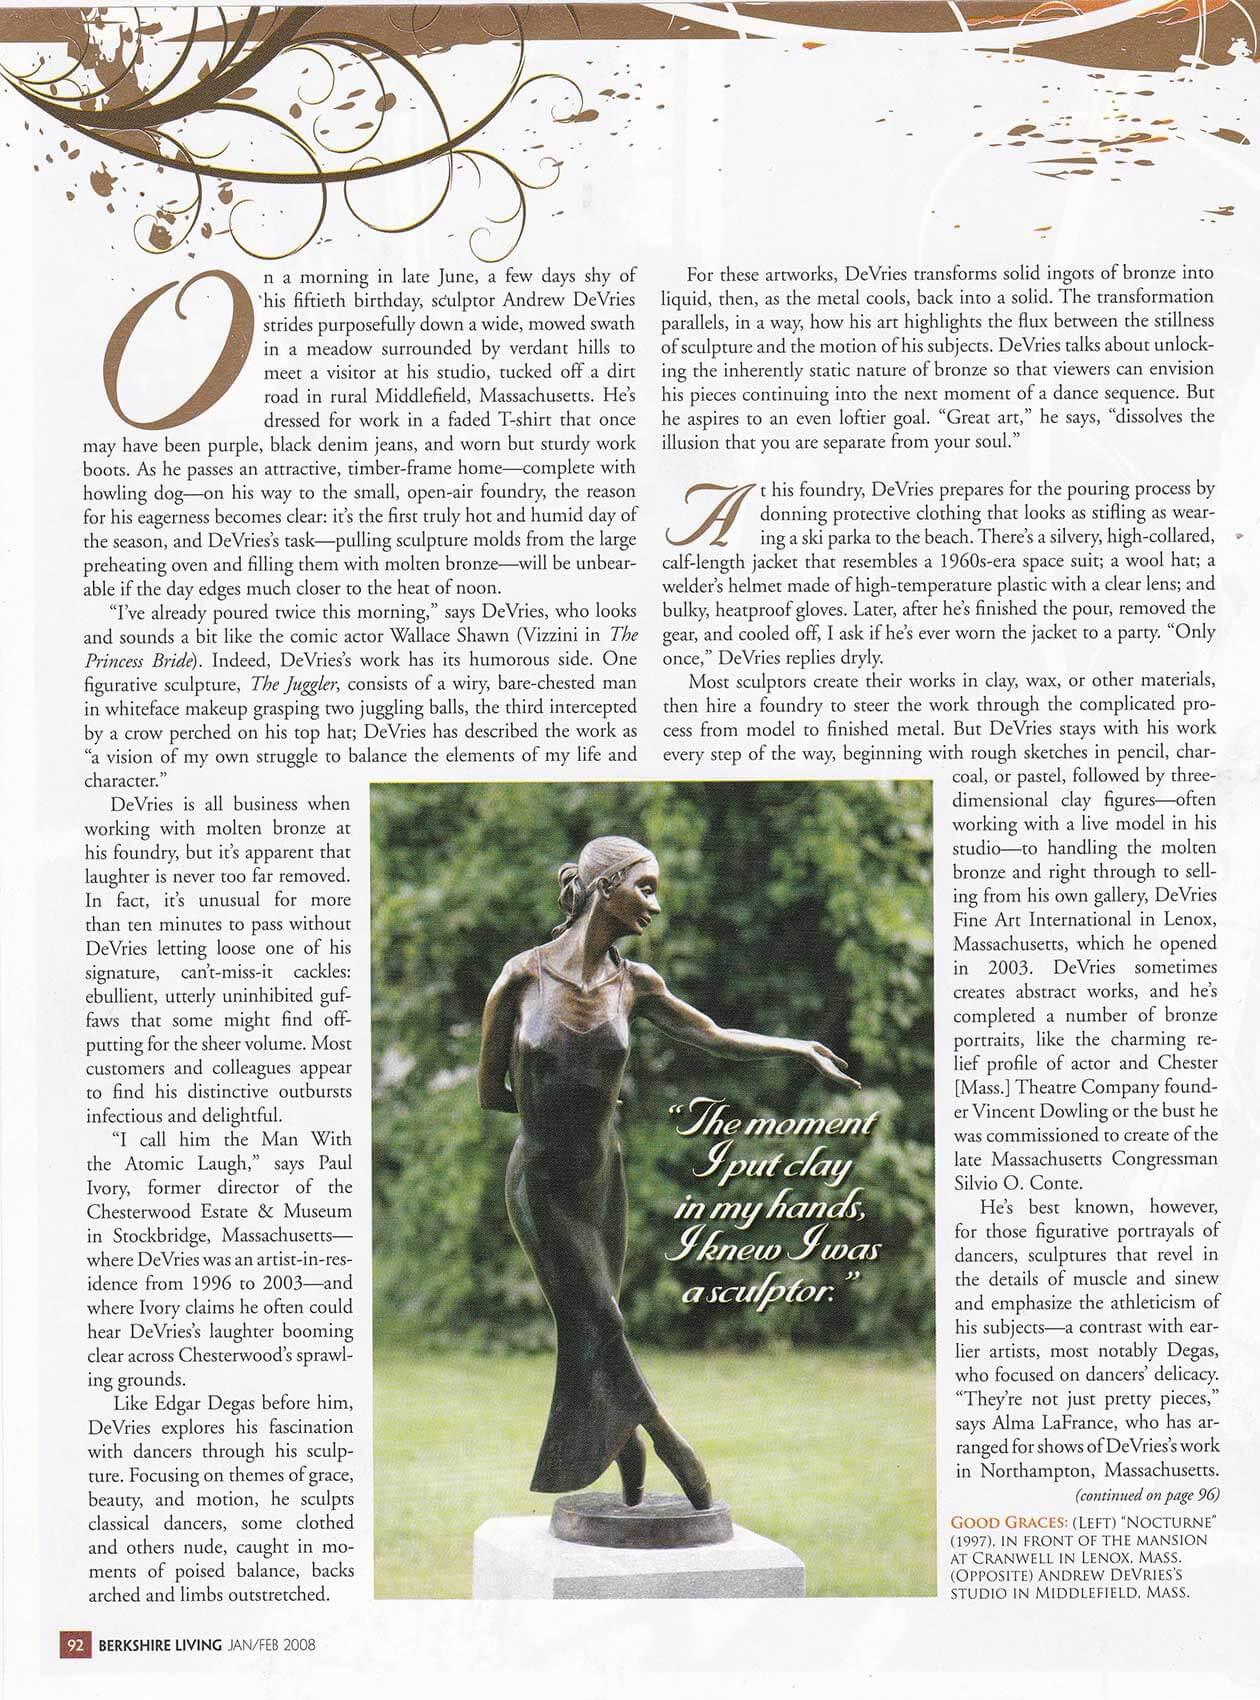 Berkshire Living Magazine January/February 2008 page 92